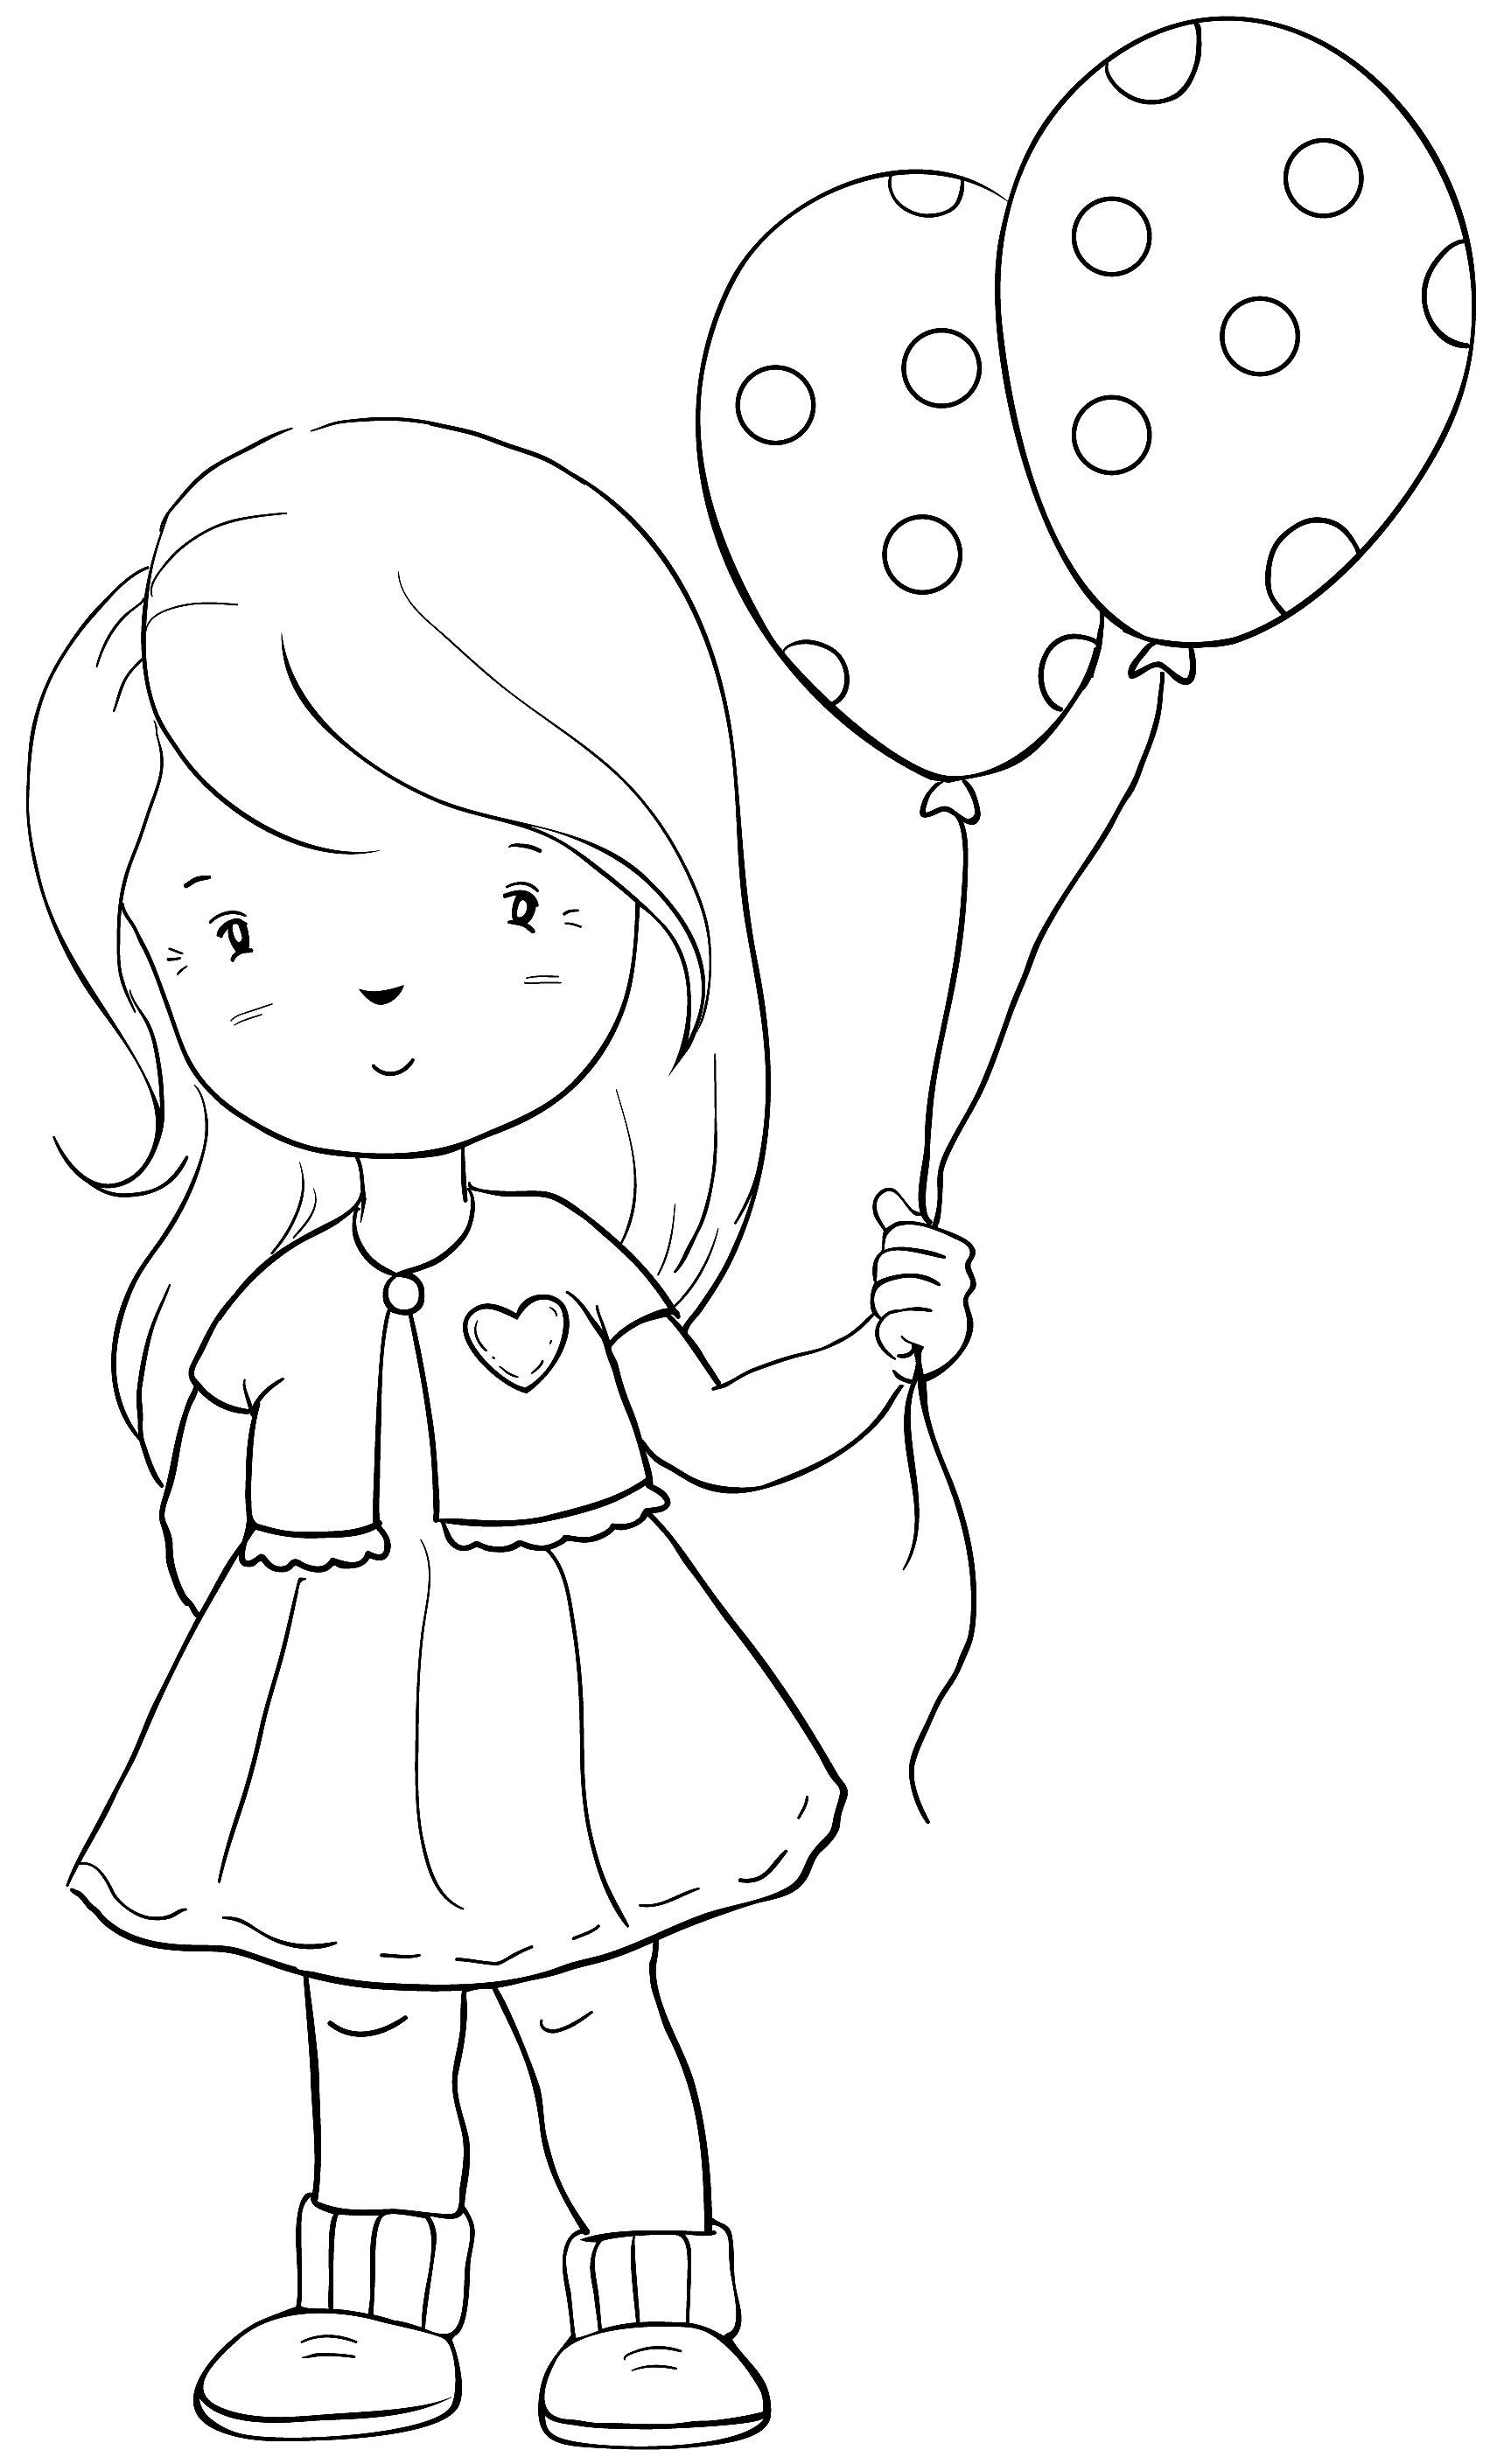 Coloriage Fille Bapteme.Petite Fille Et Ballons Bapteme Drawing For Kids Coloring